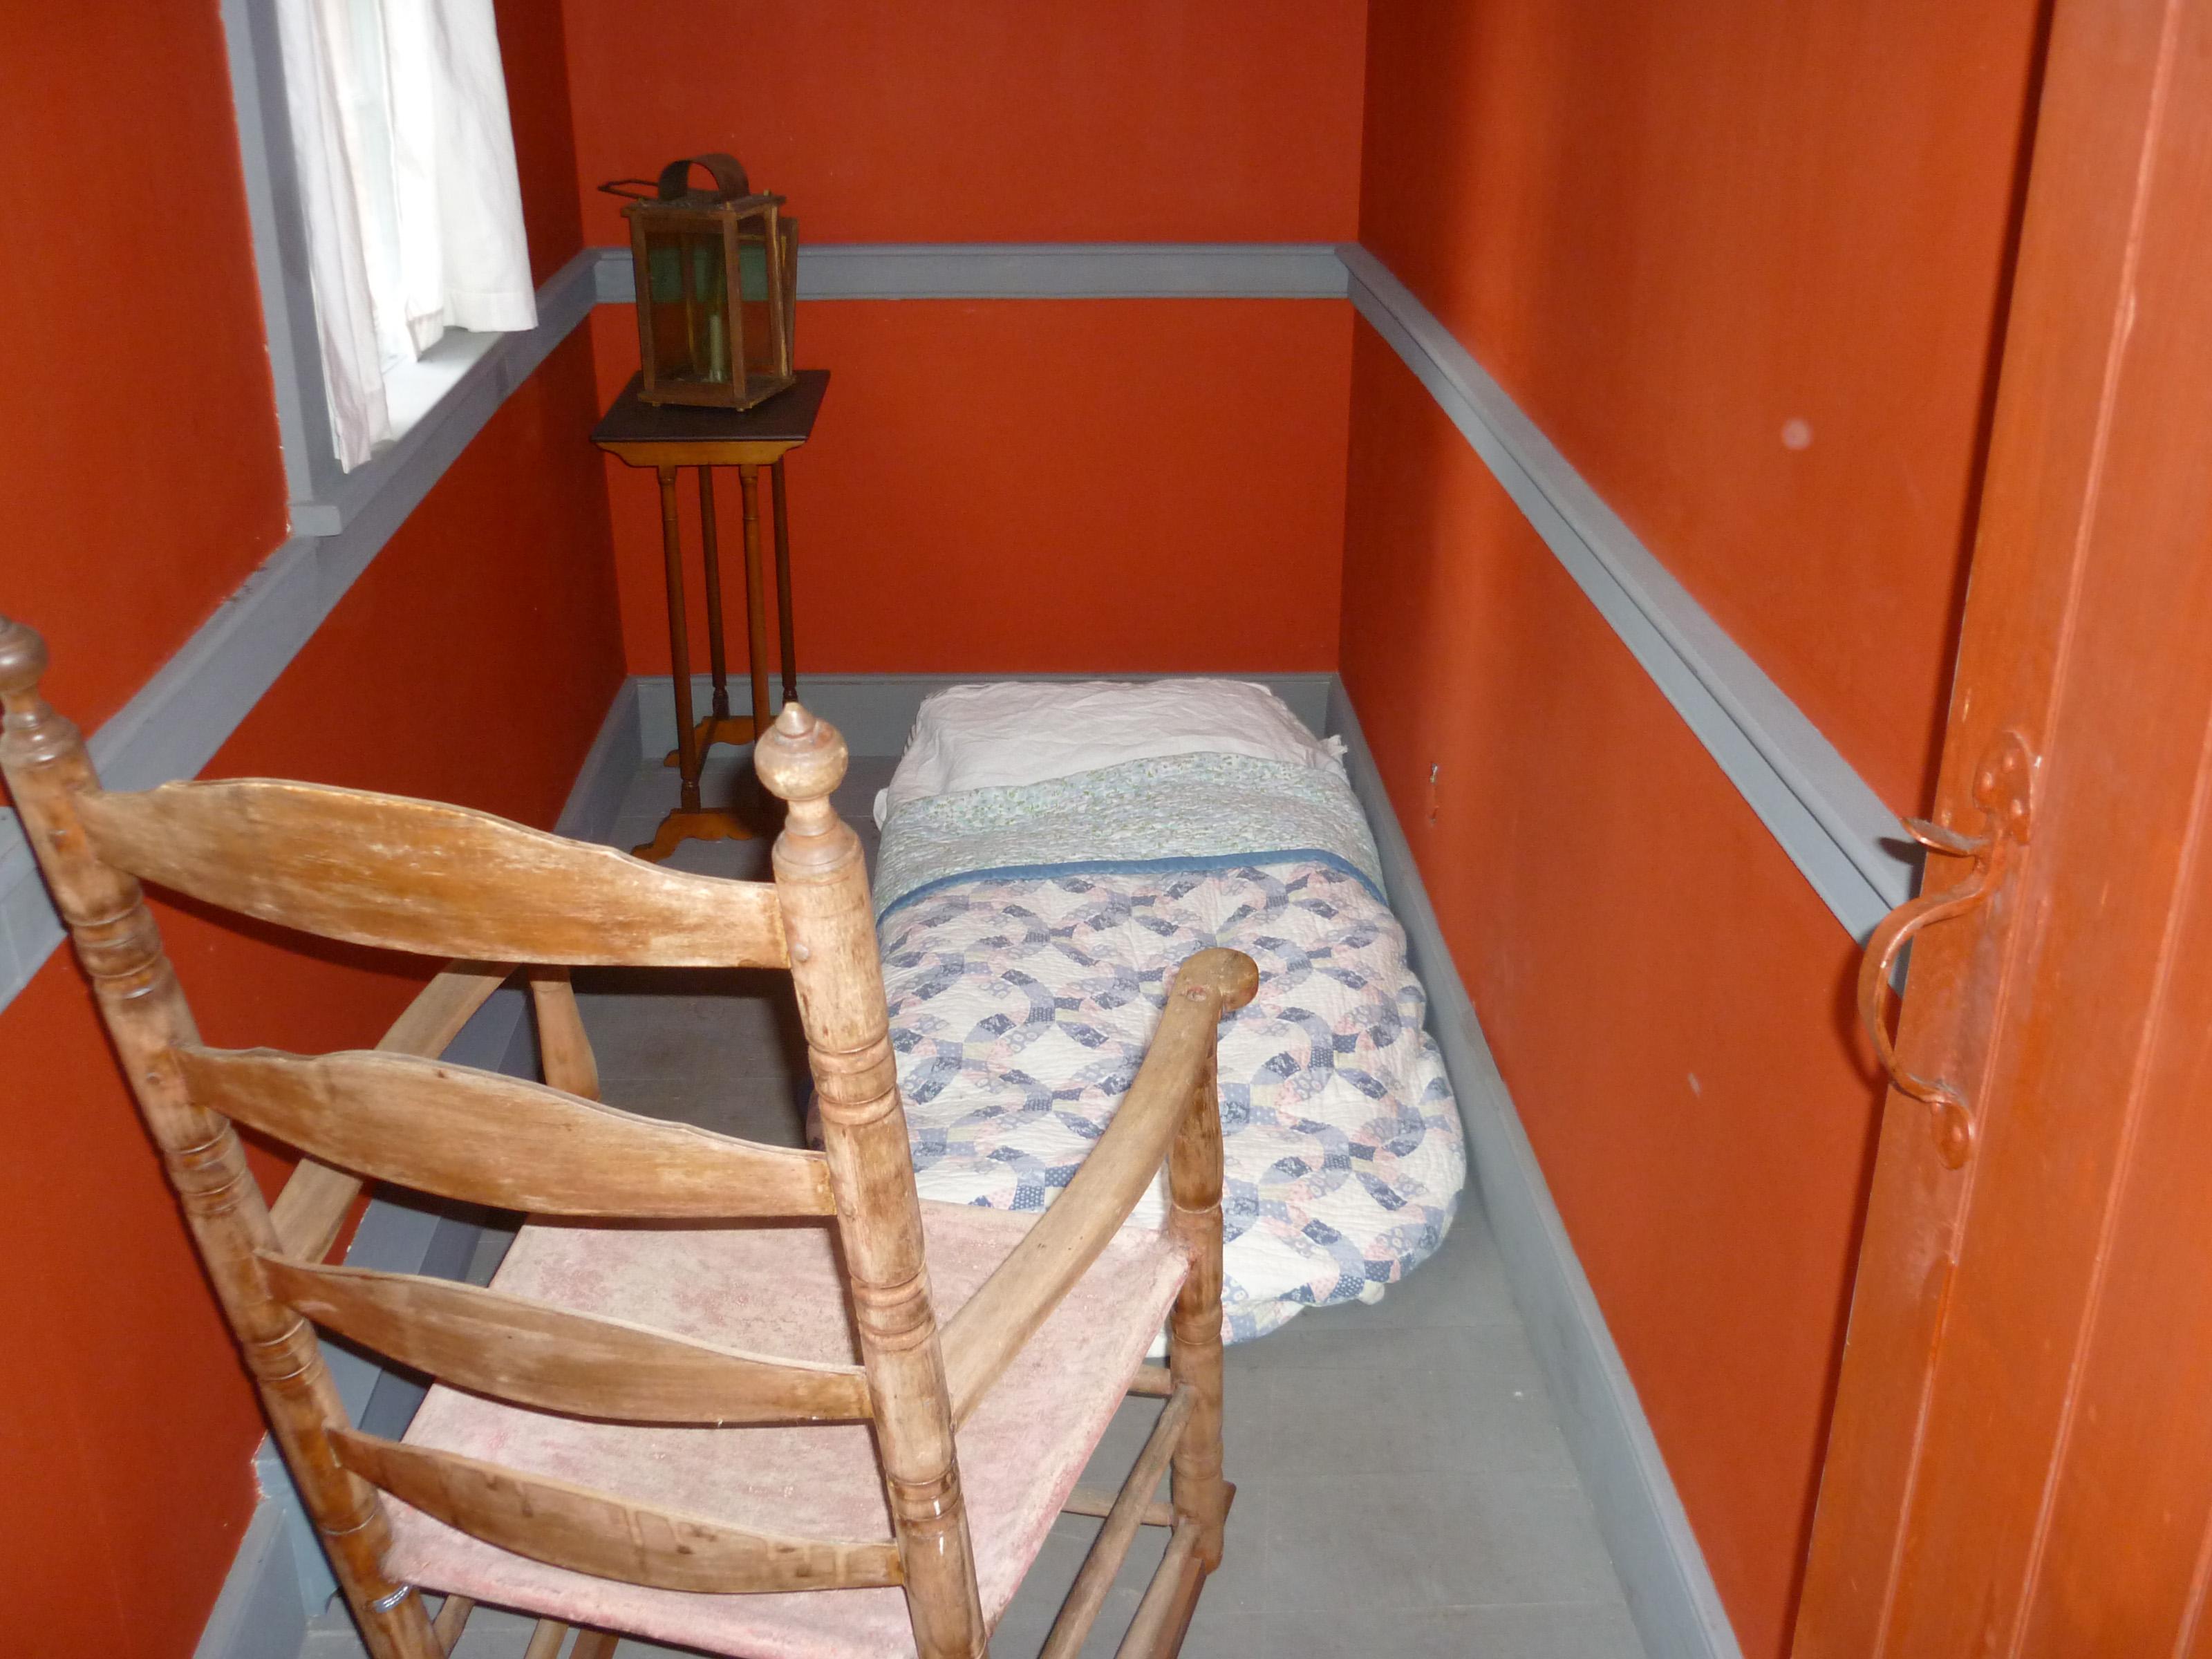 Free Stock Photo 6784 Very tiny bedroom  freeimageslive